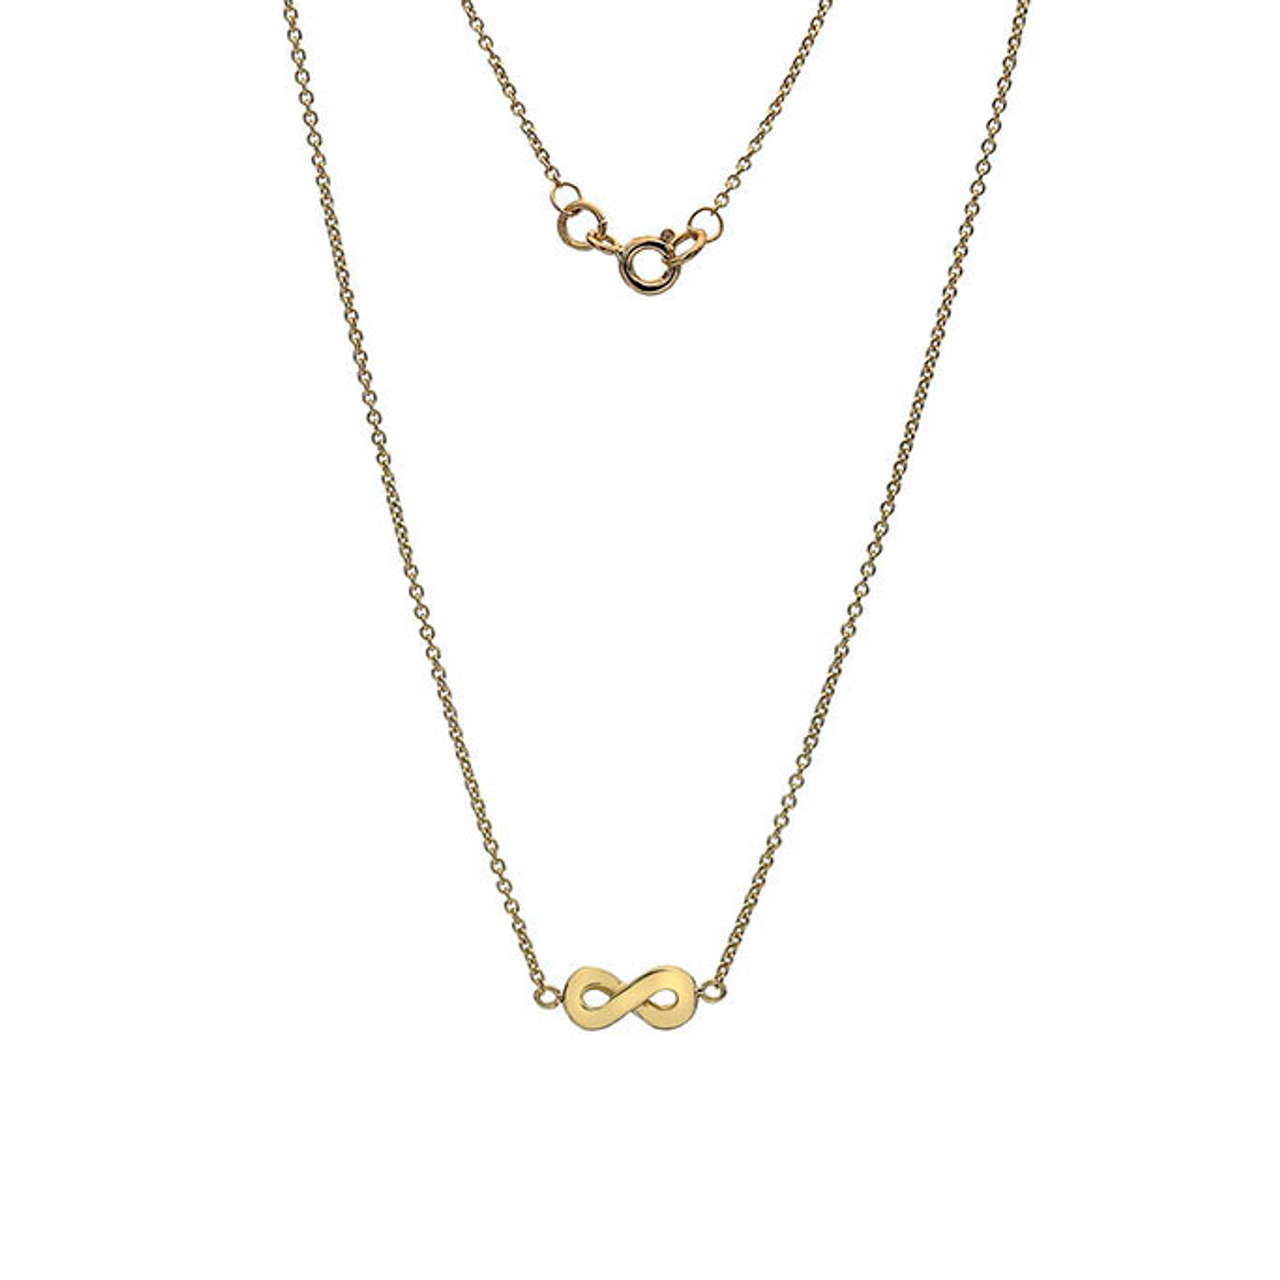 9ct Yellow Gold Infinity Pendant on Chain